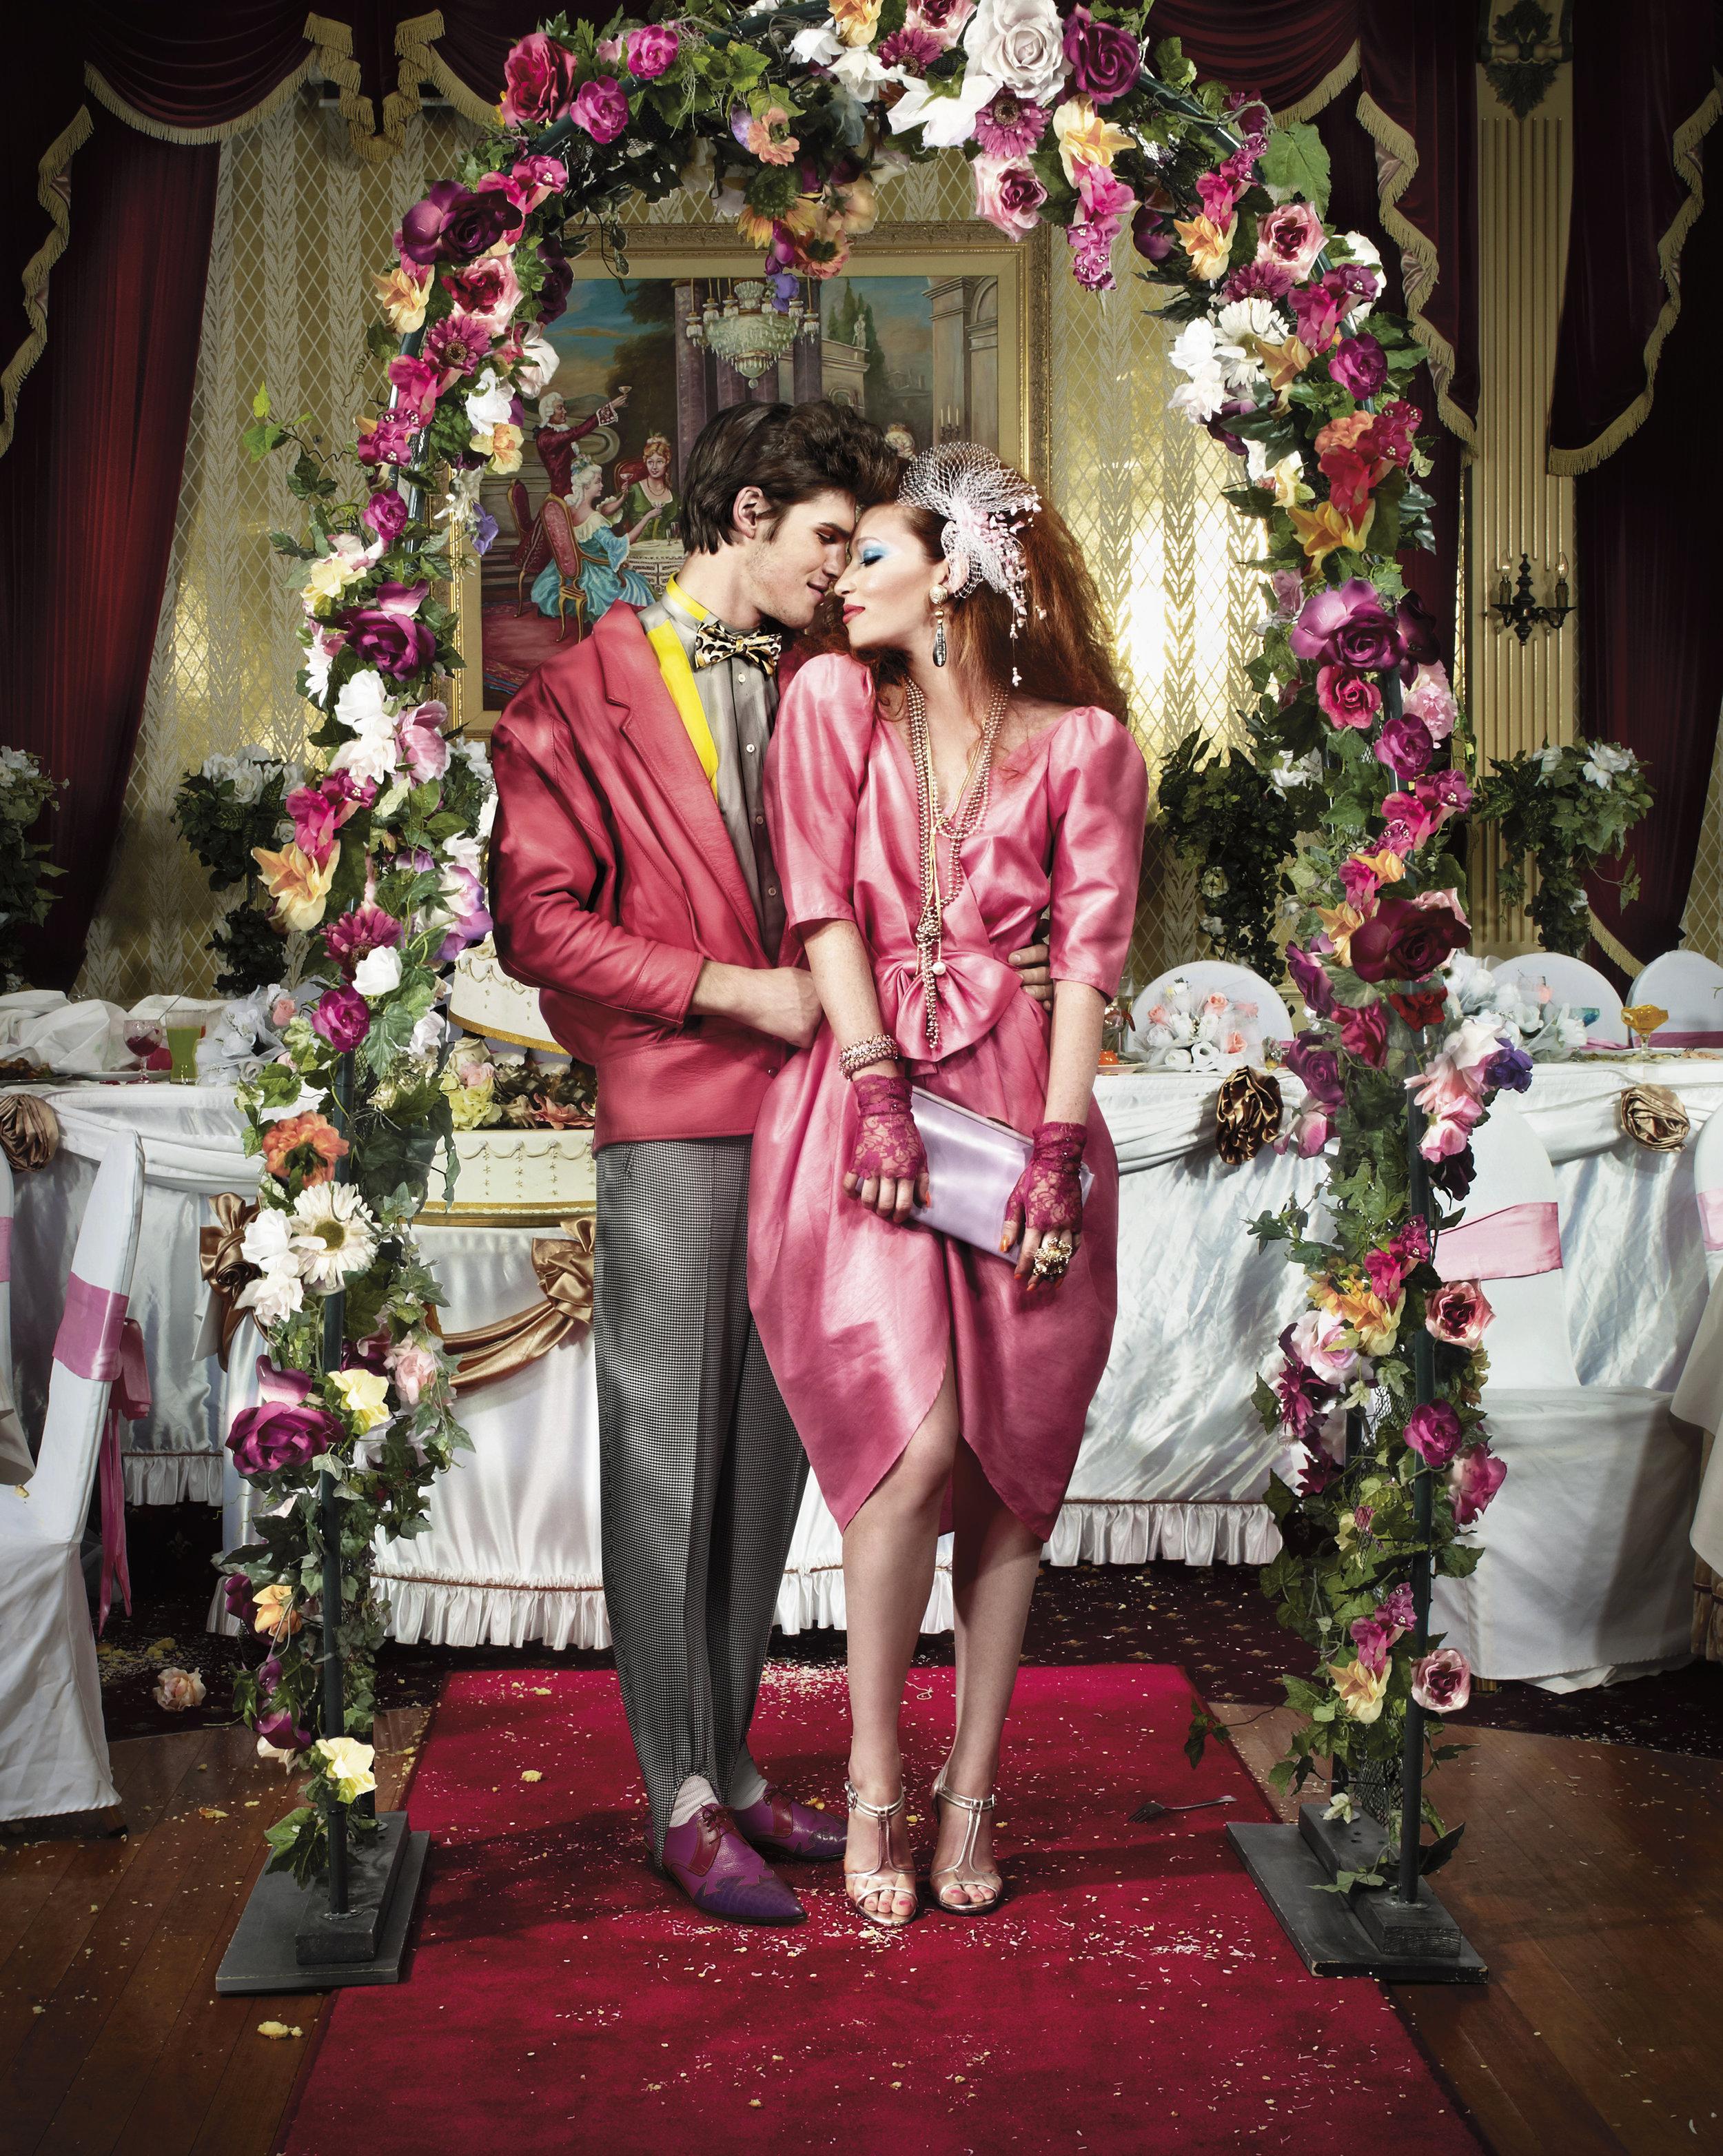 Bridesmaide and Bestman-Gerard O'Connor-Marc Wasiak.jpg